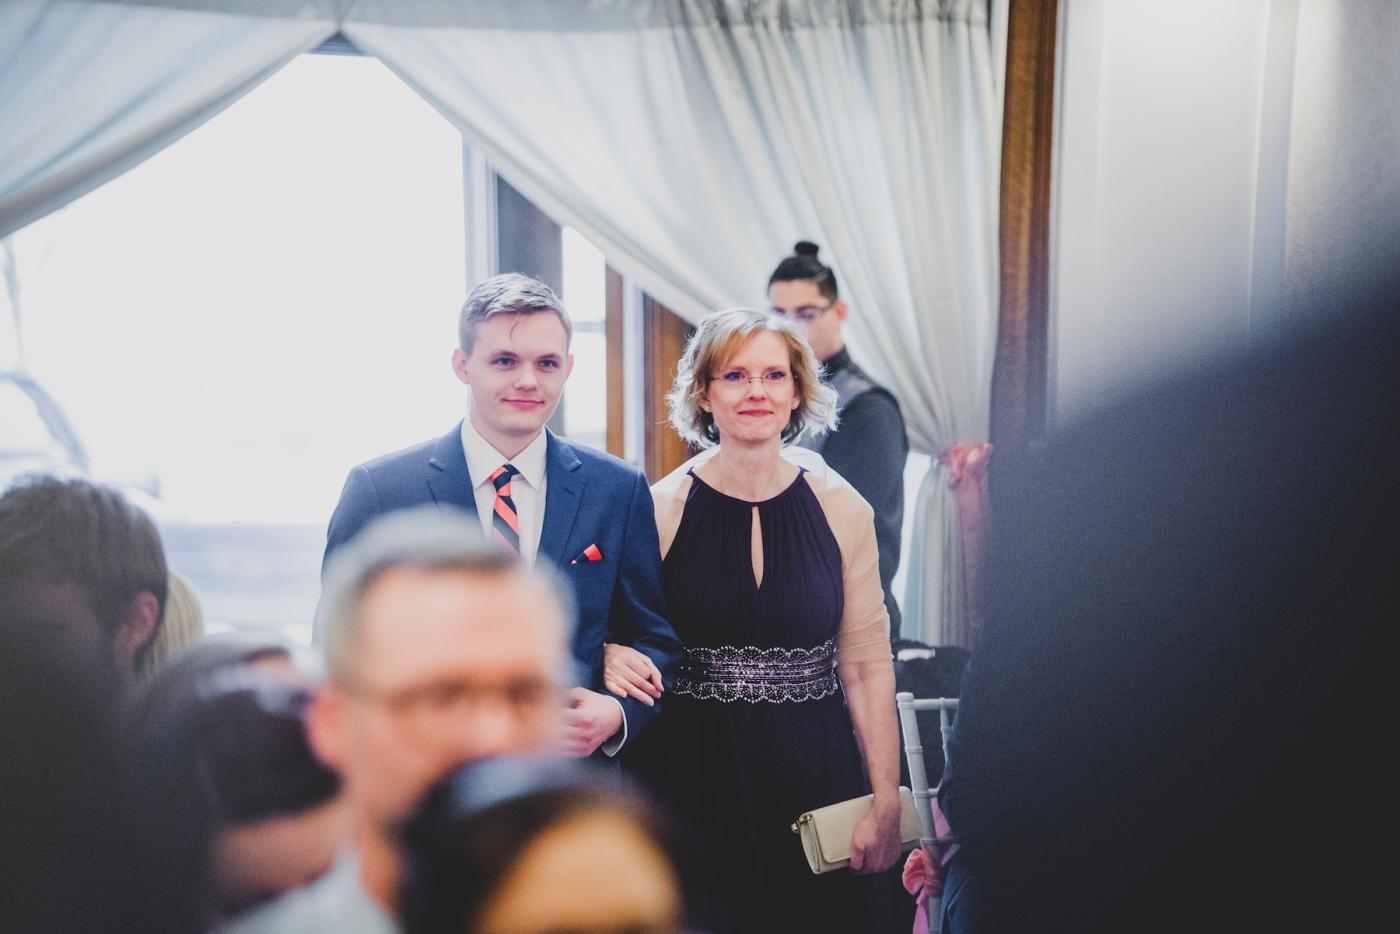 DSC_2527Everett_Wedding_Ballroom_Jane_Speleers_photography_Rachel_and_Edmund_Ceremony_2017